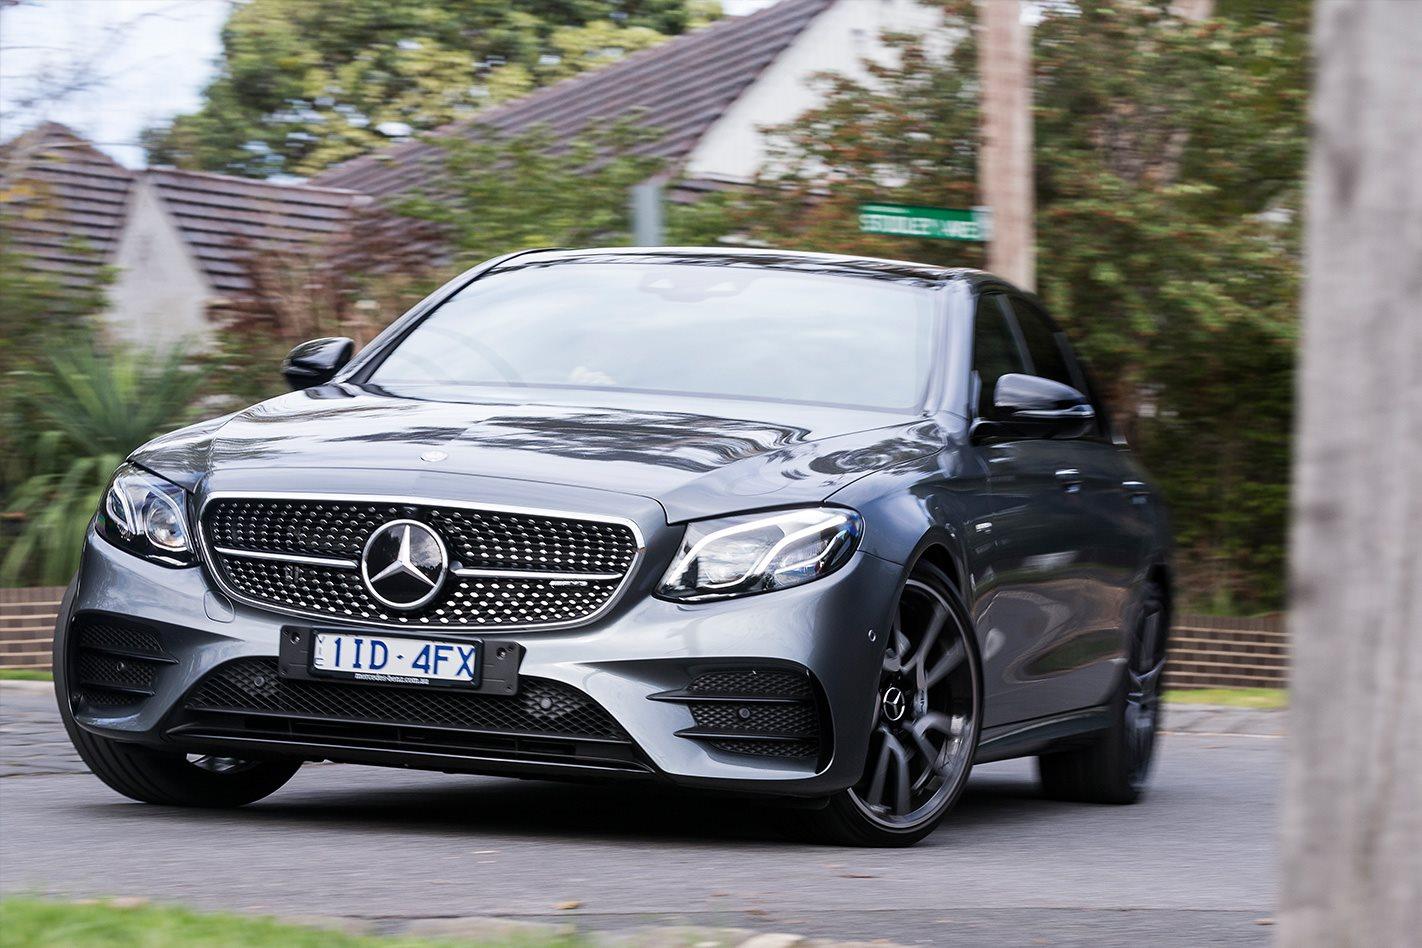 2017 Mercedes-AMG E43 long-term car review, part two